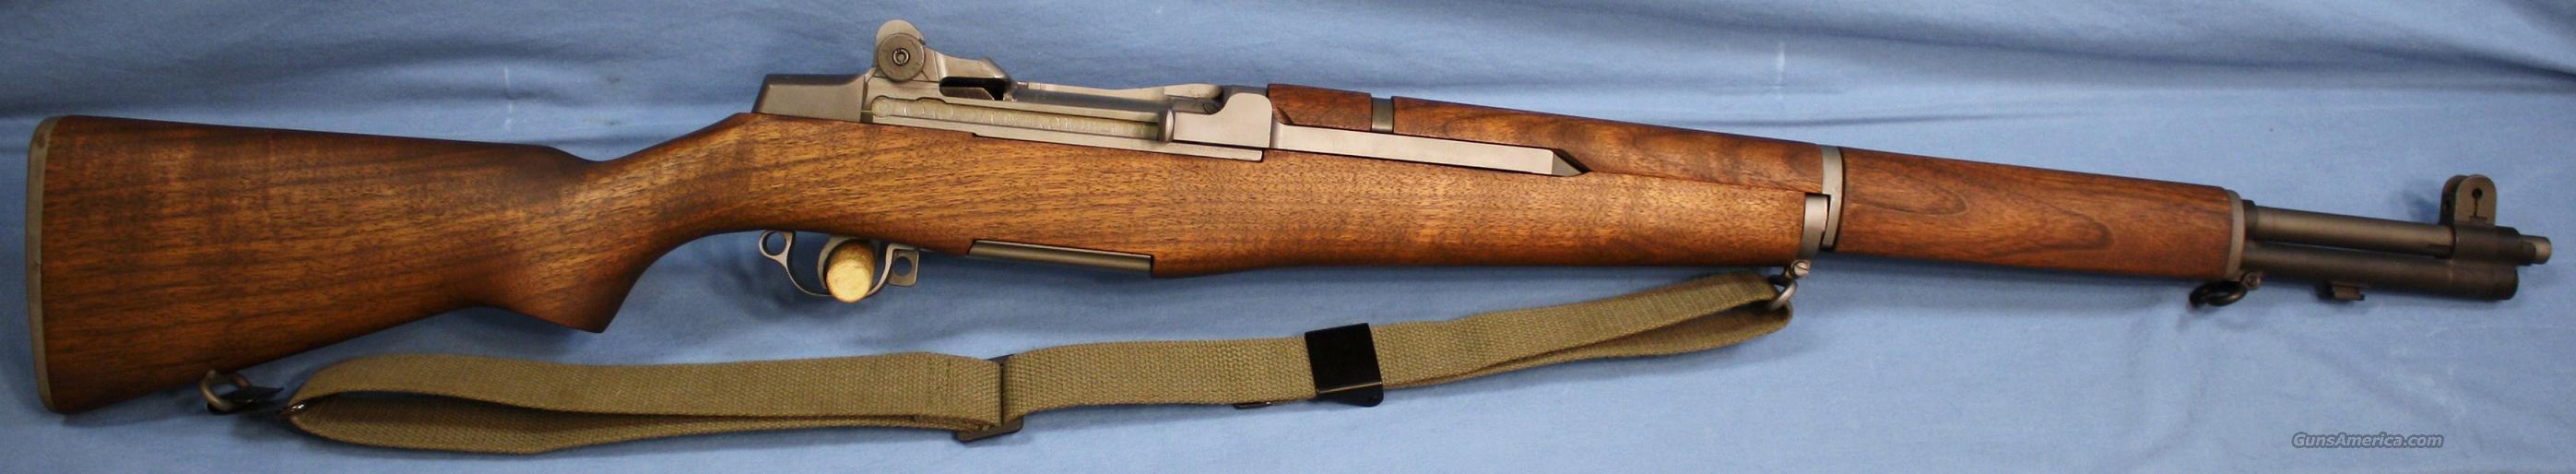 U.S. Army Springfield M1 Garand Semi-Automatic Rifle 30-06 James River  Armory Refurbish. 5705321.jpg